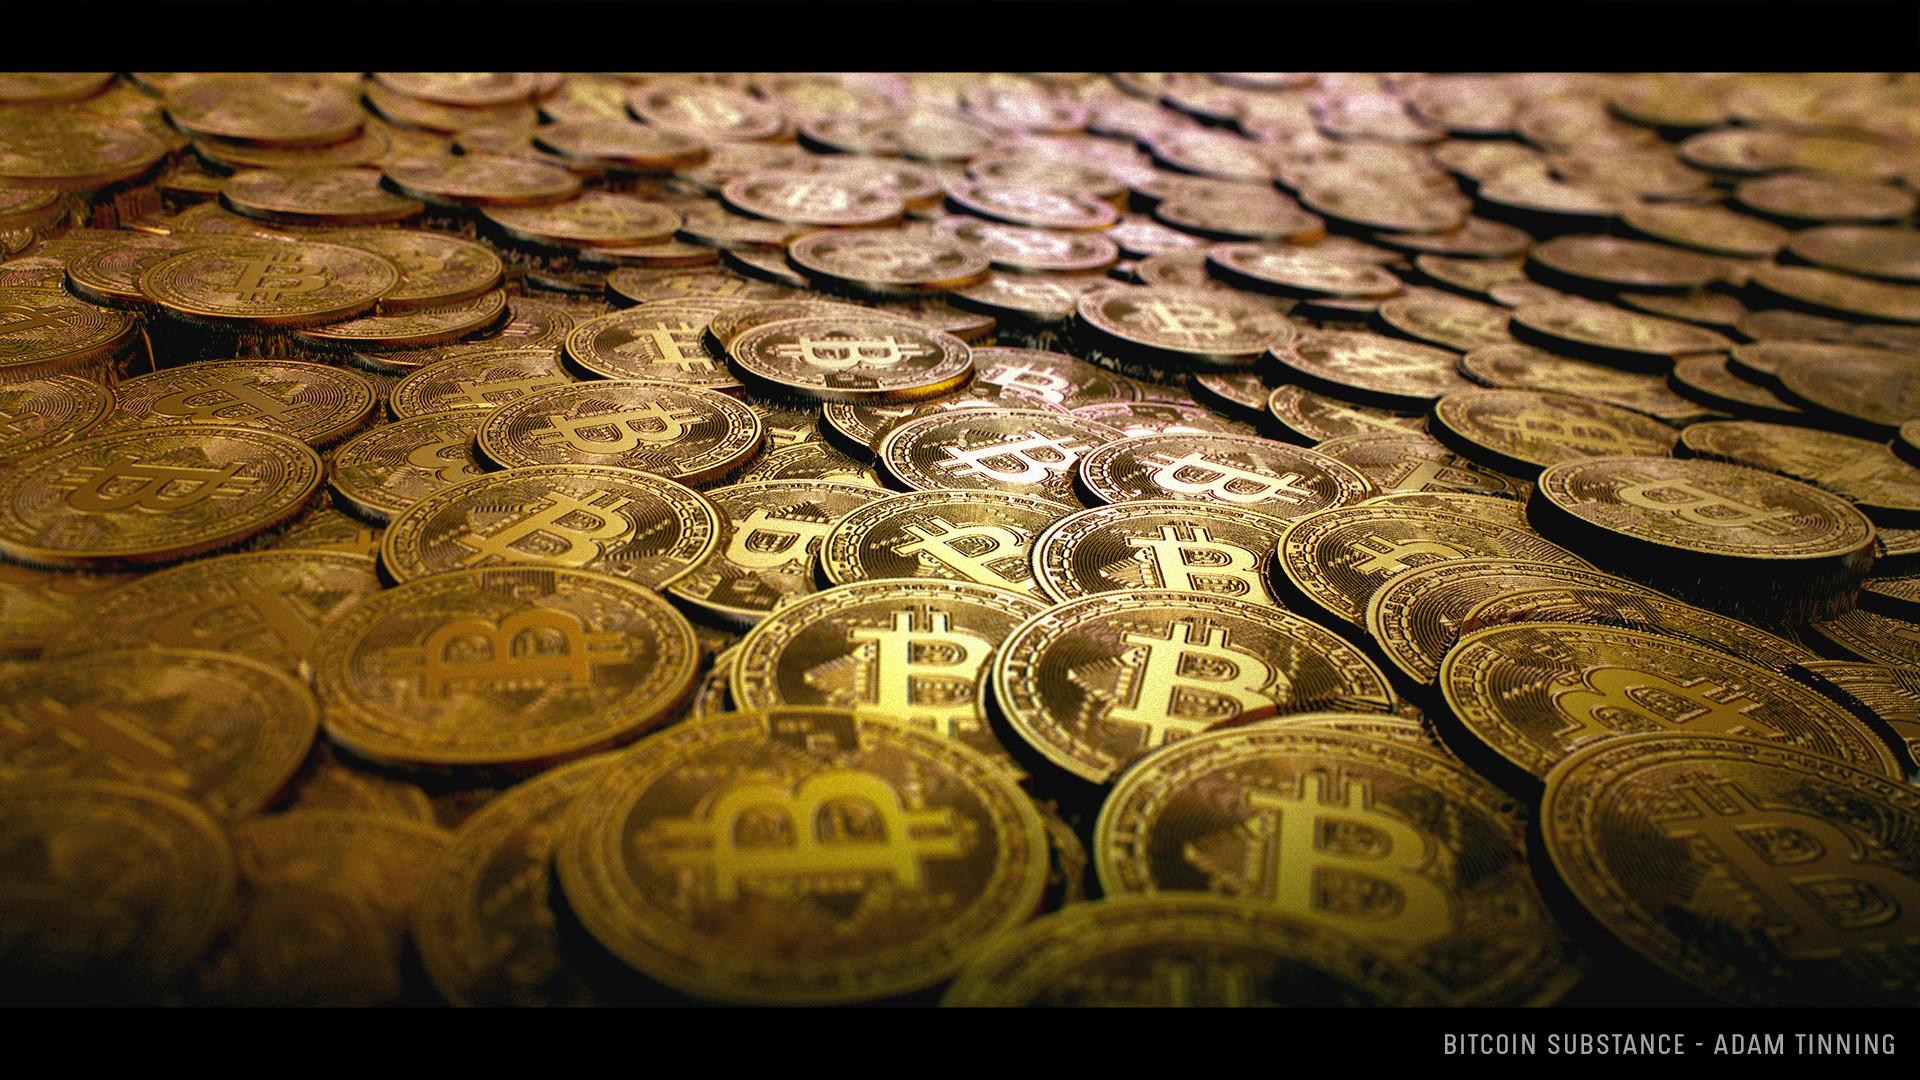 Adam tinning bitcoin adamtinning 002